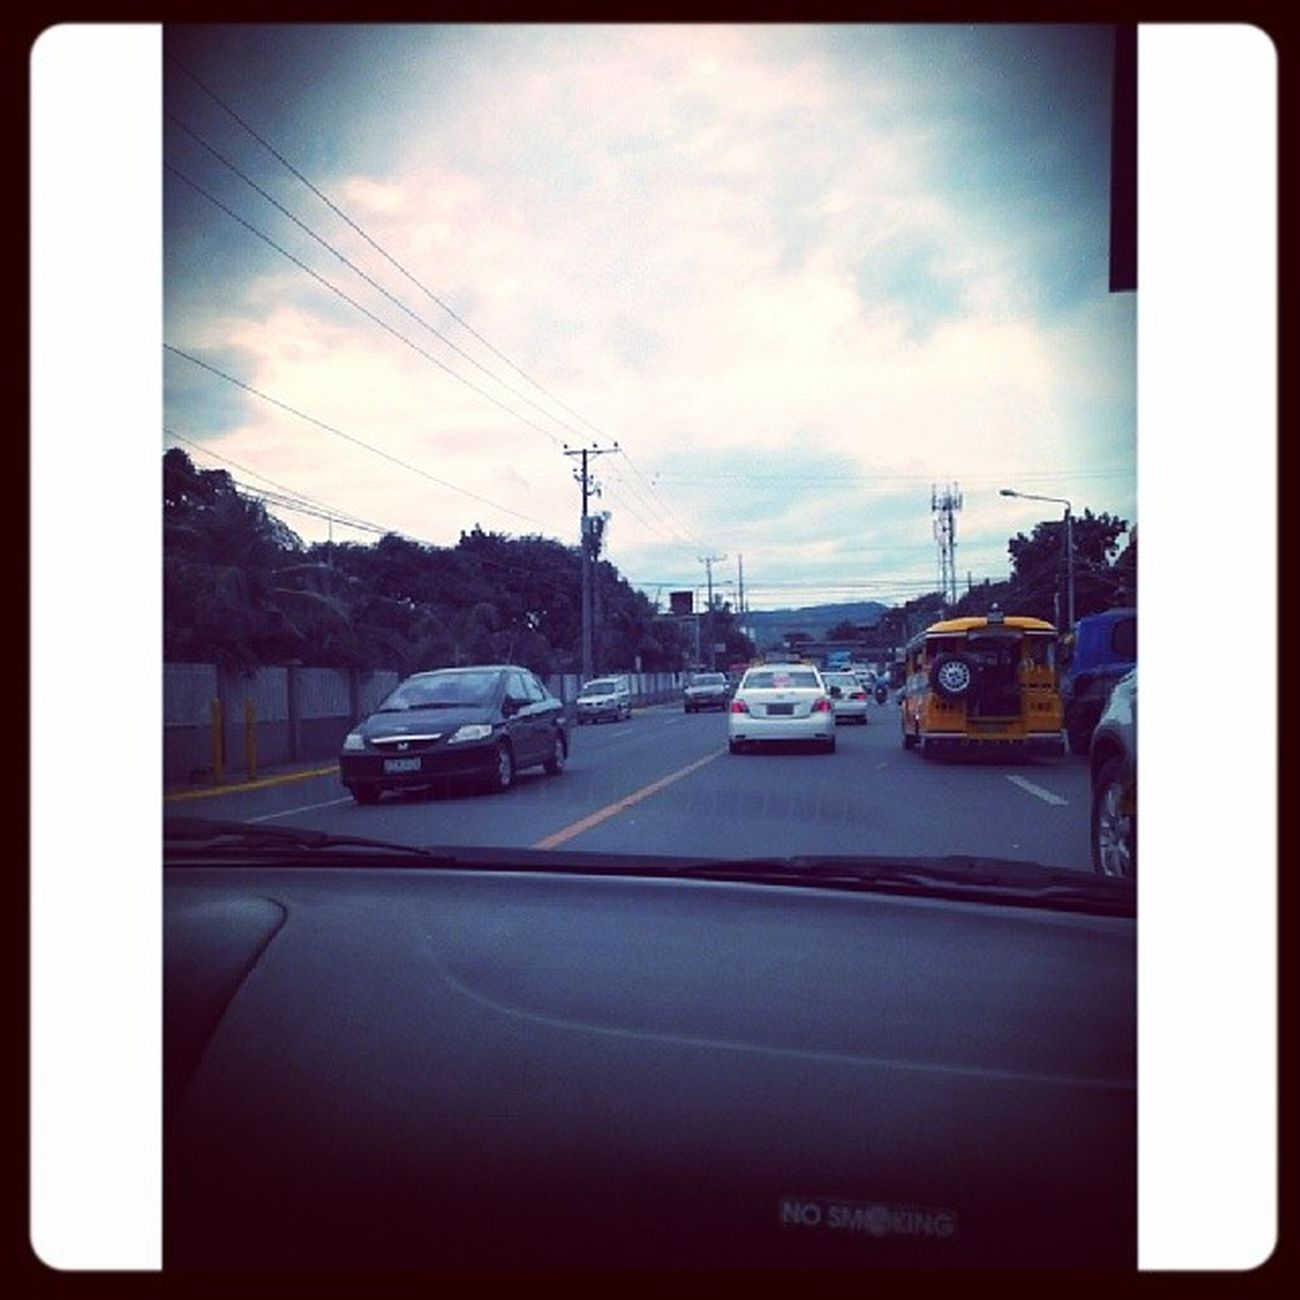 Hapsay ug linaw ang kadalanan.Lunes Monday Peaceful Uncrowded street highway cars love lifeigers igersasia Philippines Cebu Pinoy iglike iglove igdaily potd LenovoMobilePH fotodroids cool_capture latergram LitratongPinoy lenovos820 pinasshoutout vsco vscocam vscoph random randomness